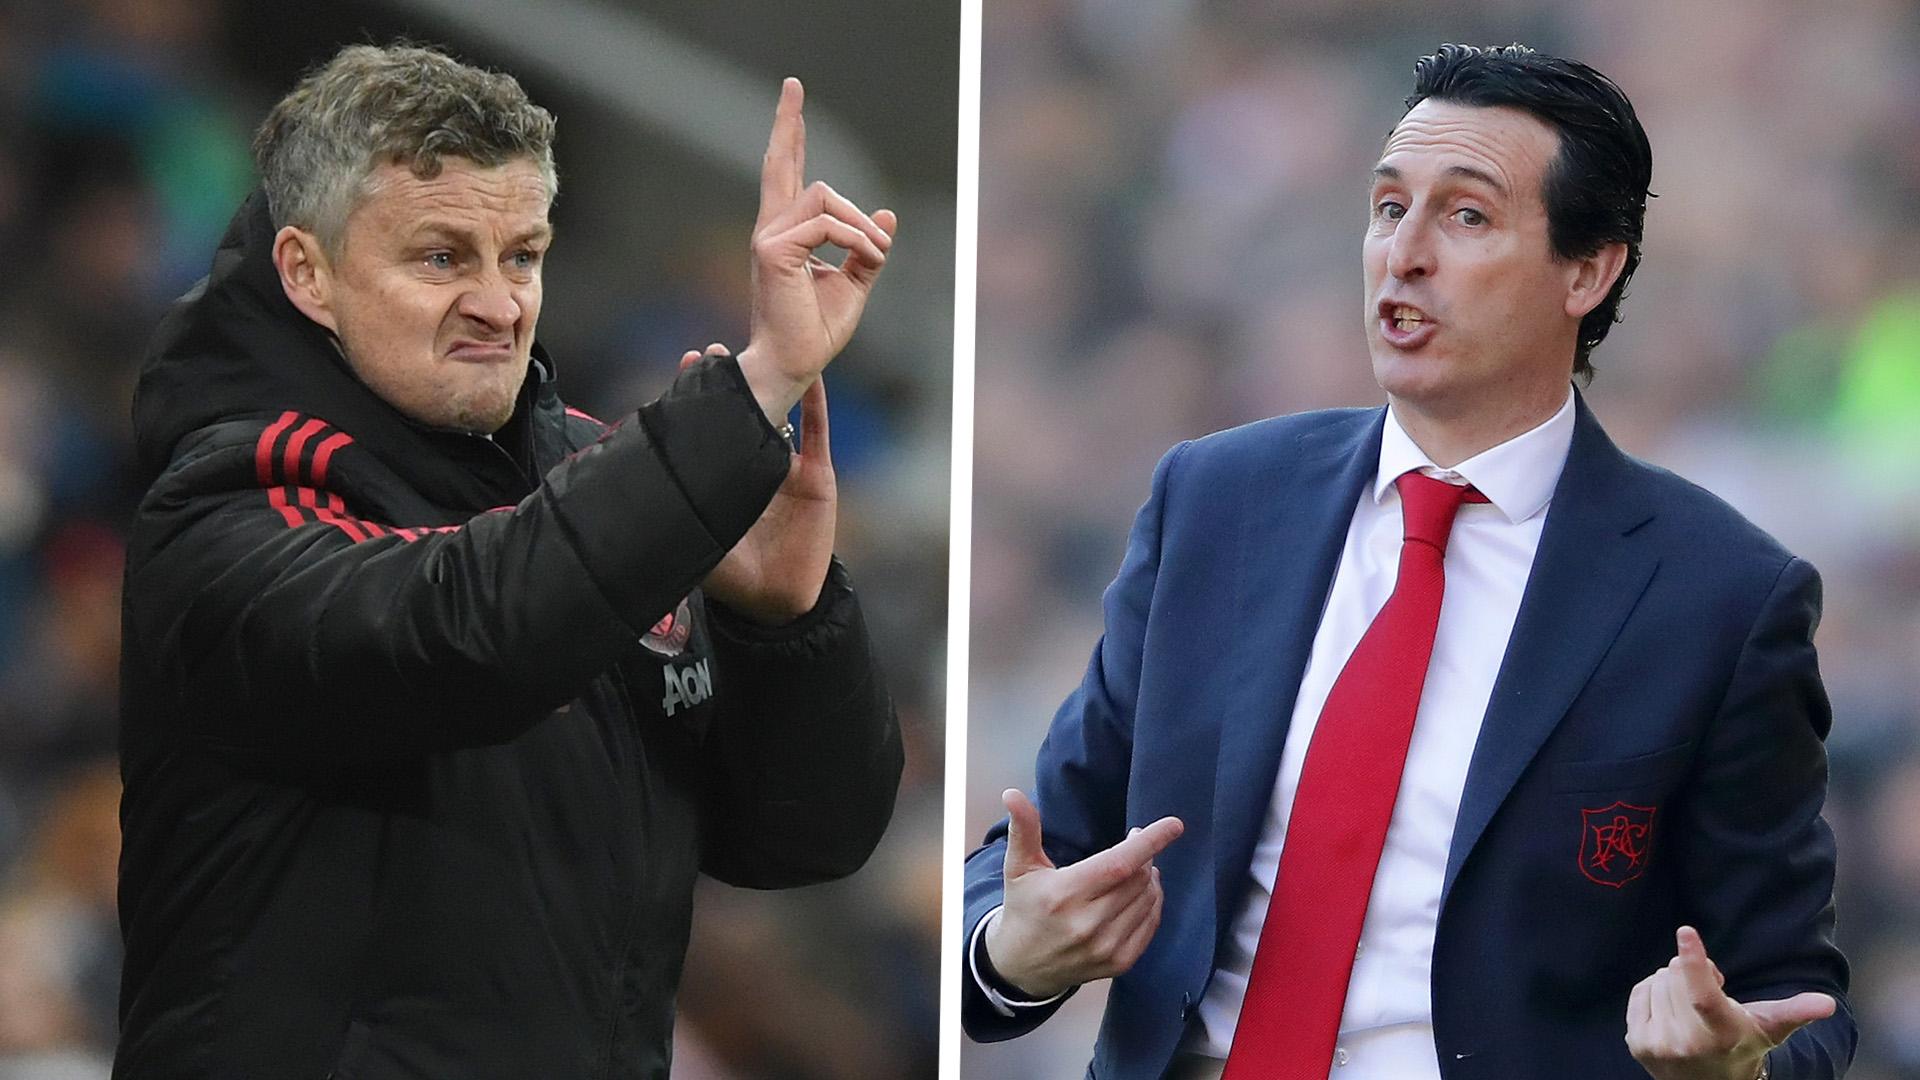 Arsenal news: 'Ole Gunnar Solskjaer isn't good enough & Chelsea are in  turmoil' – Gunners hero Perry Groves hoping for top-four bid | Goal.com